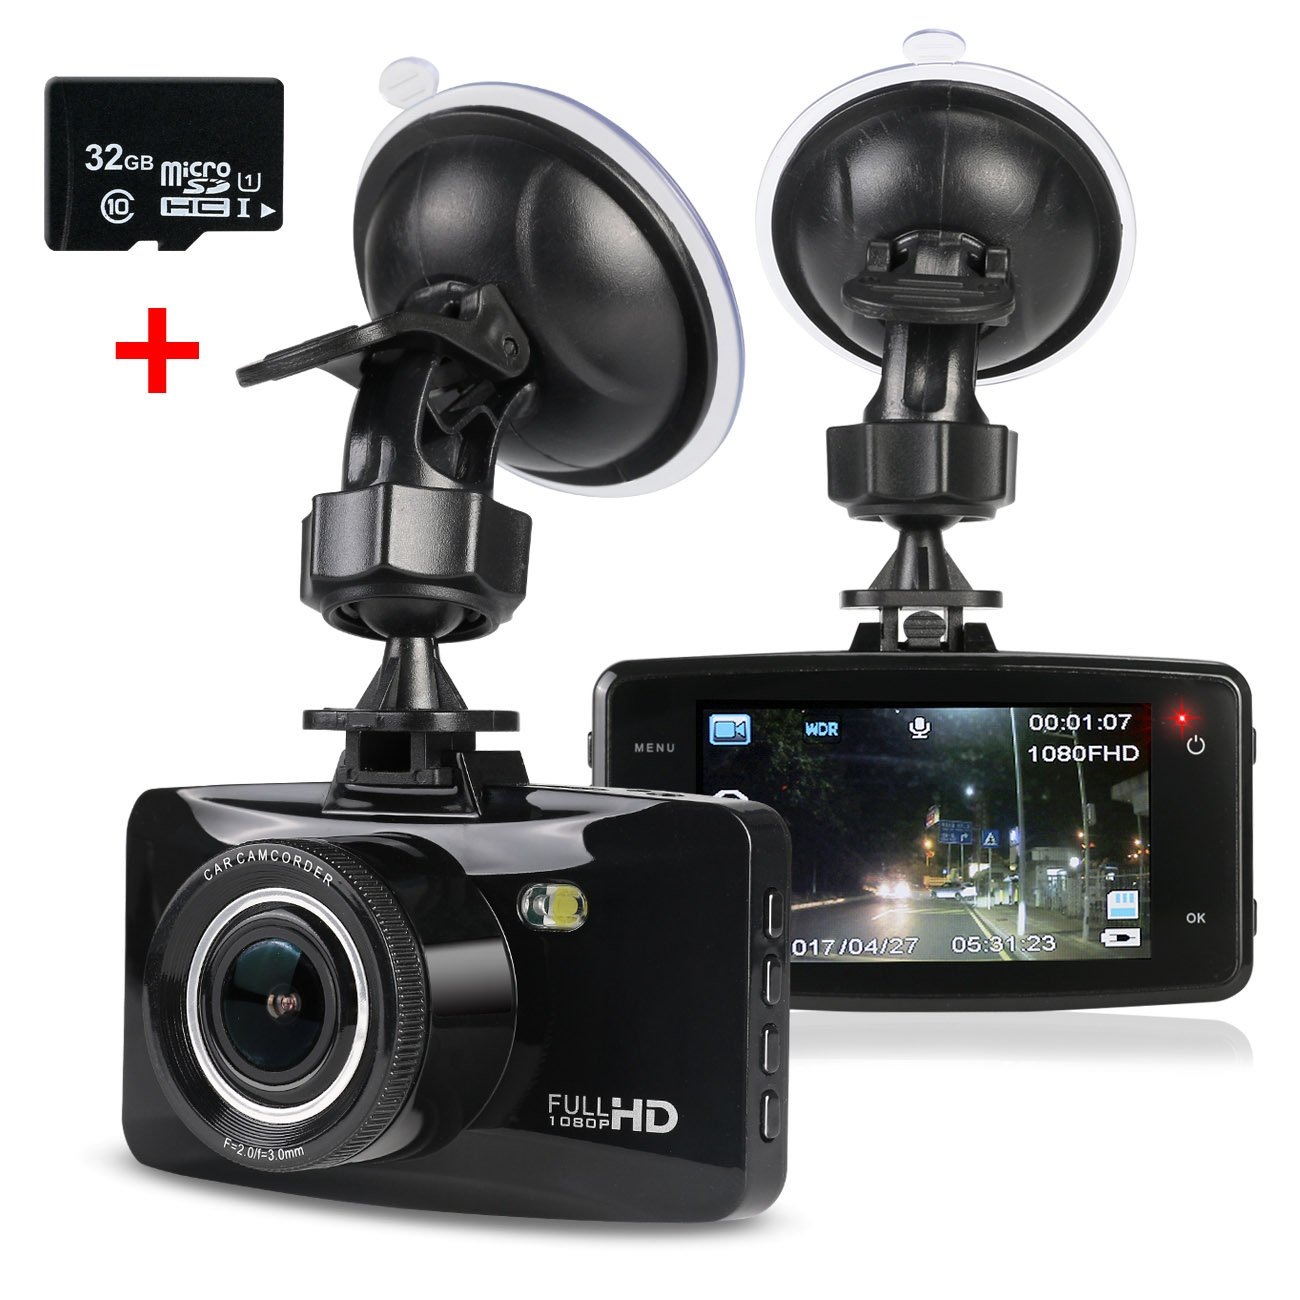 trofotyダッシュカメラHD 1080p 170度広角車カメラダッシュボードカメラ運転レコーダーナイトビジョン、Gセンサー、32gb Micro SDカード B076D5NRQ5